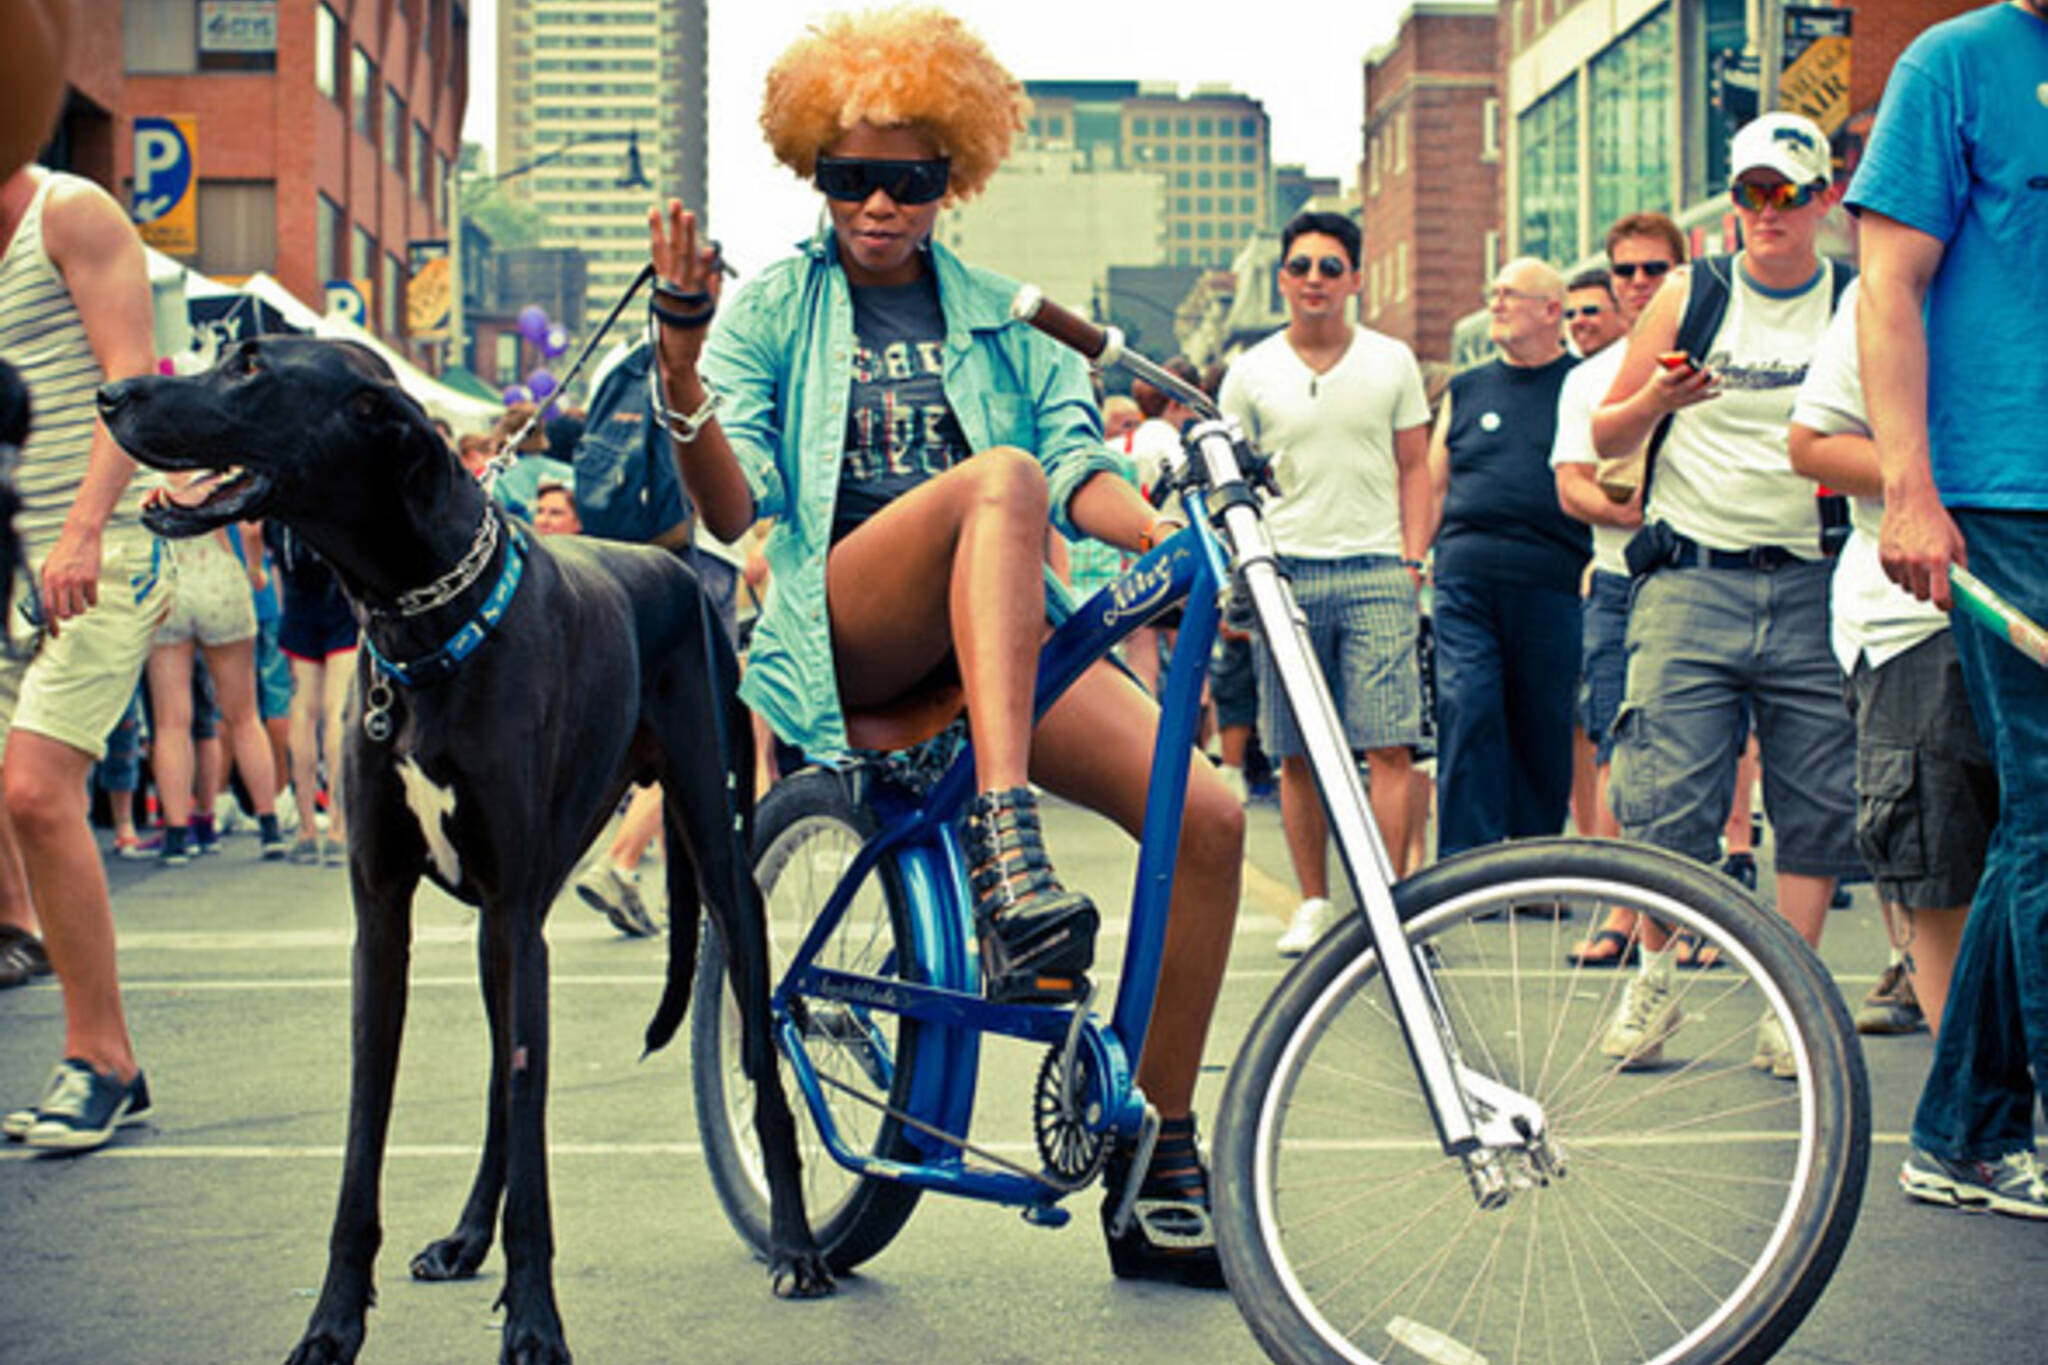 dog, street, scene